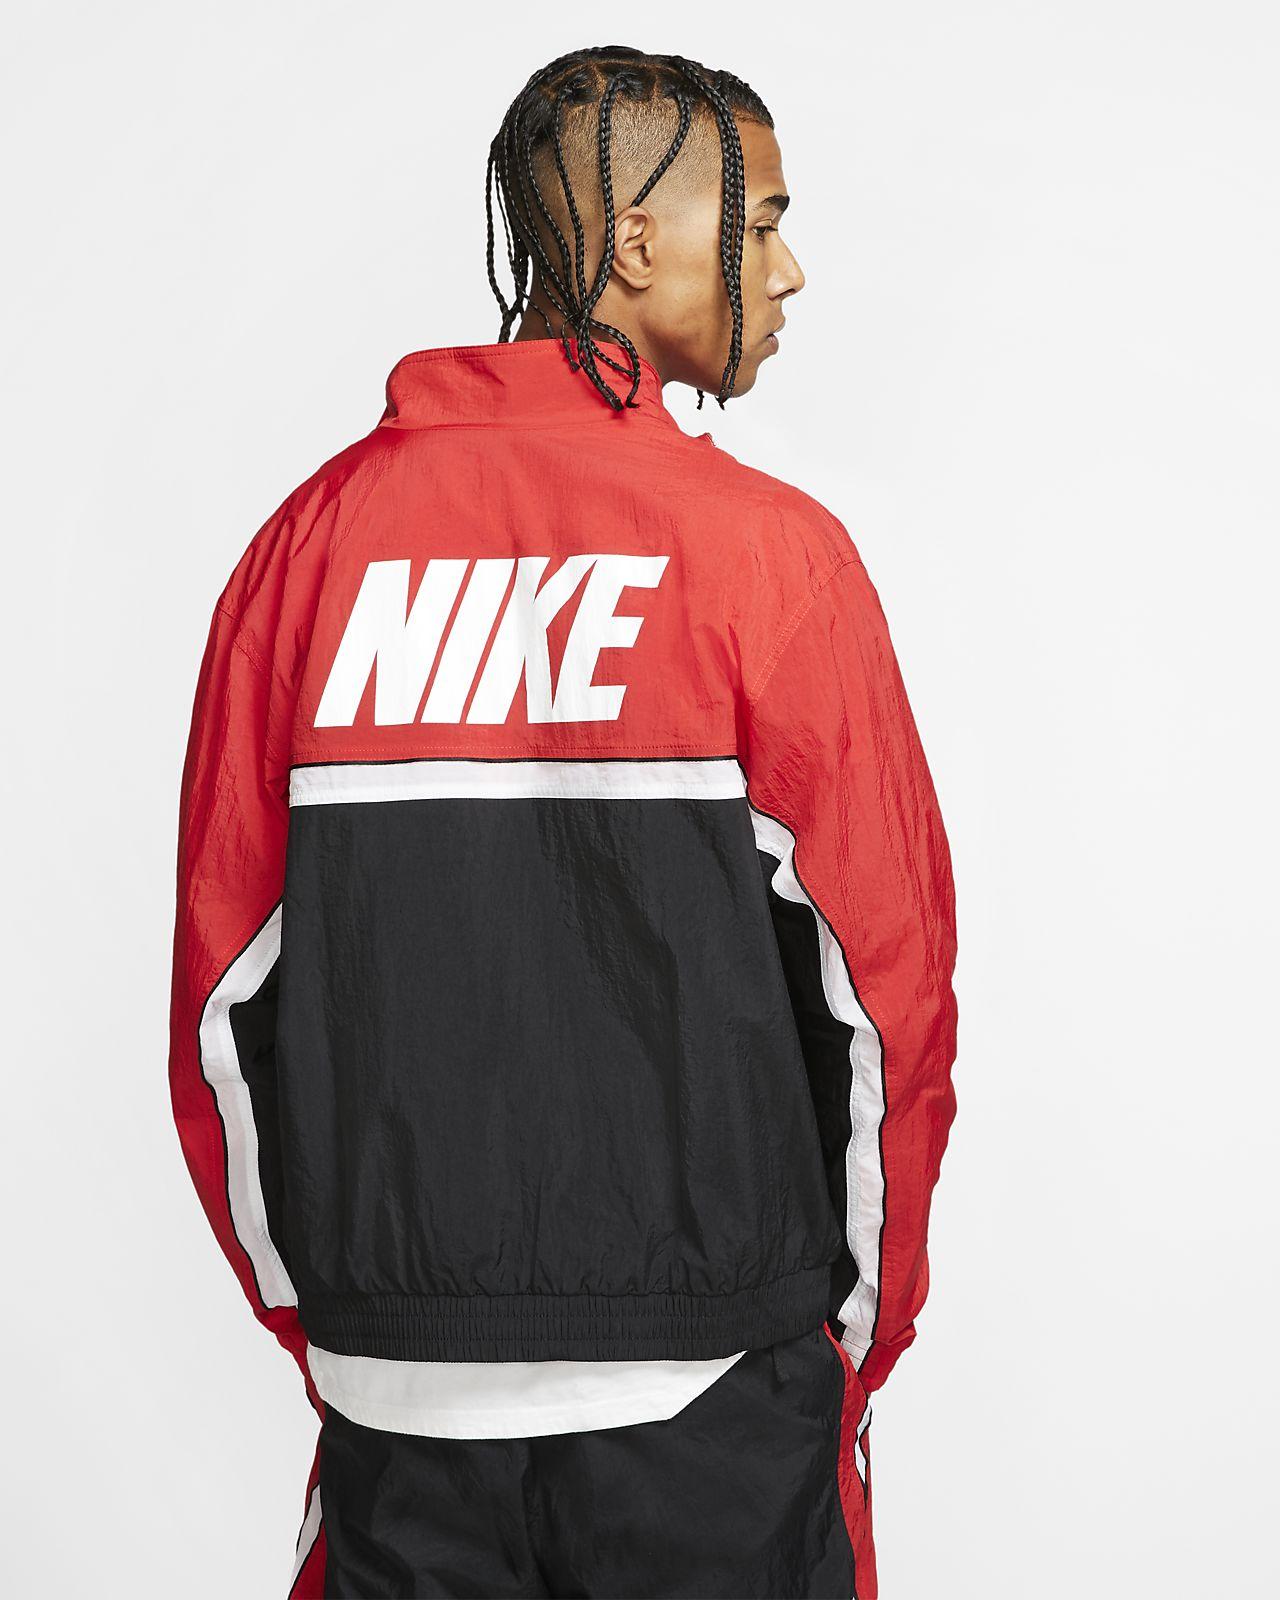 New Authentic Nike Men Nike Jackets Fashion, View Cheap Nike